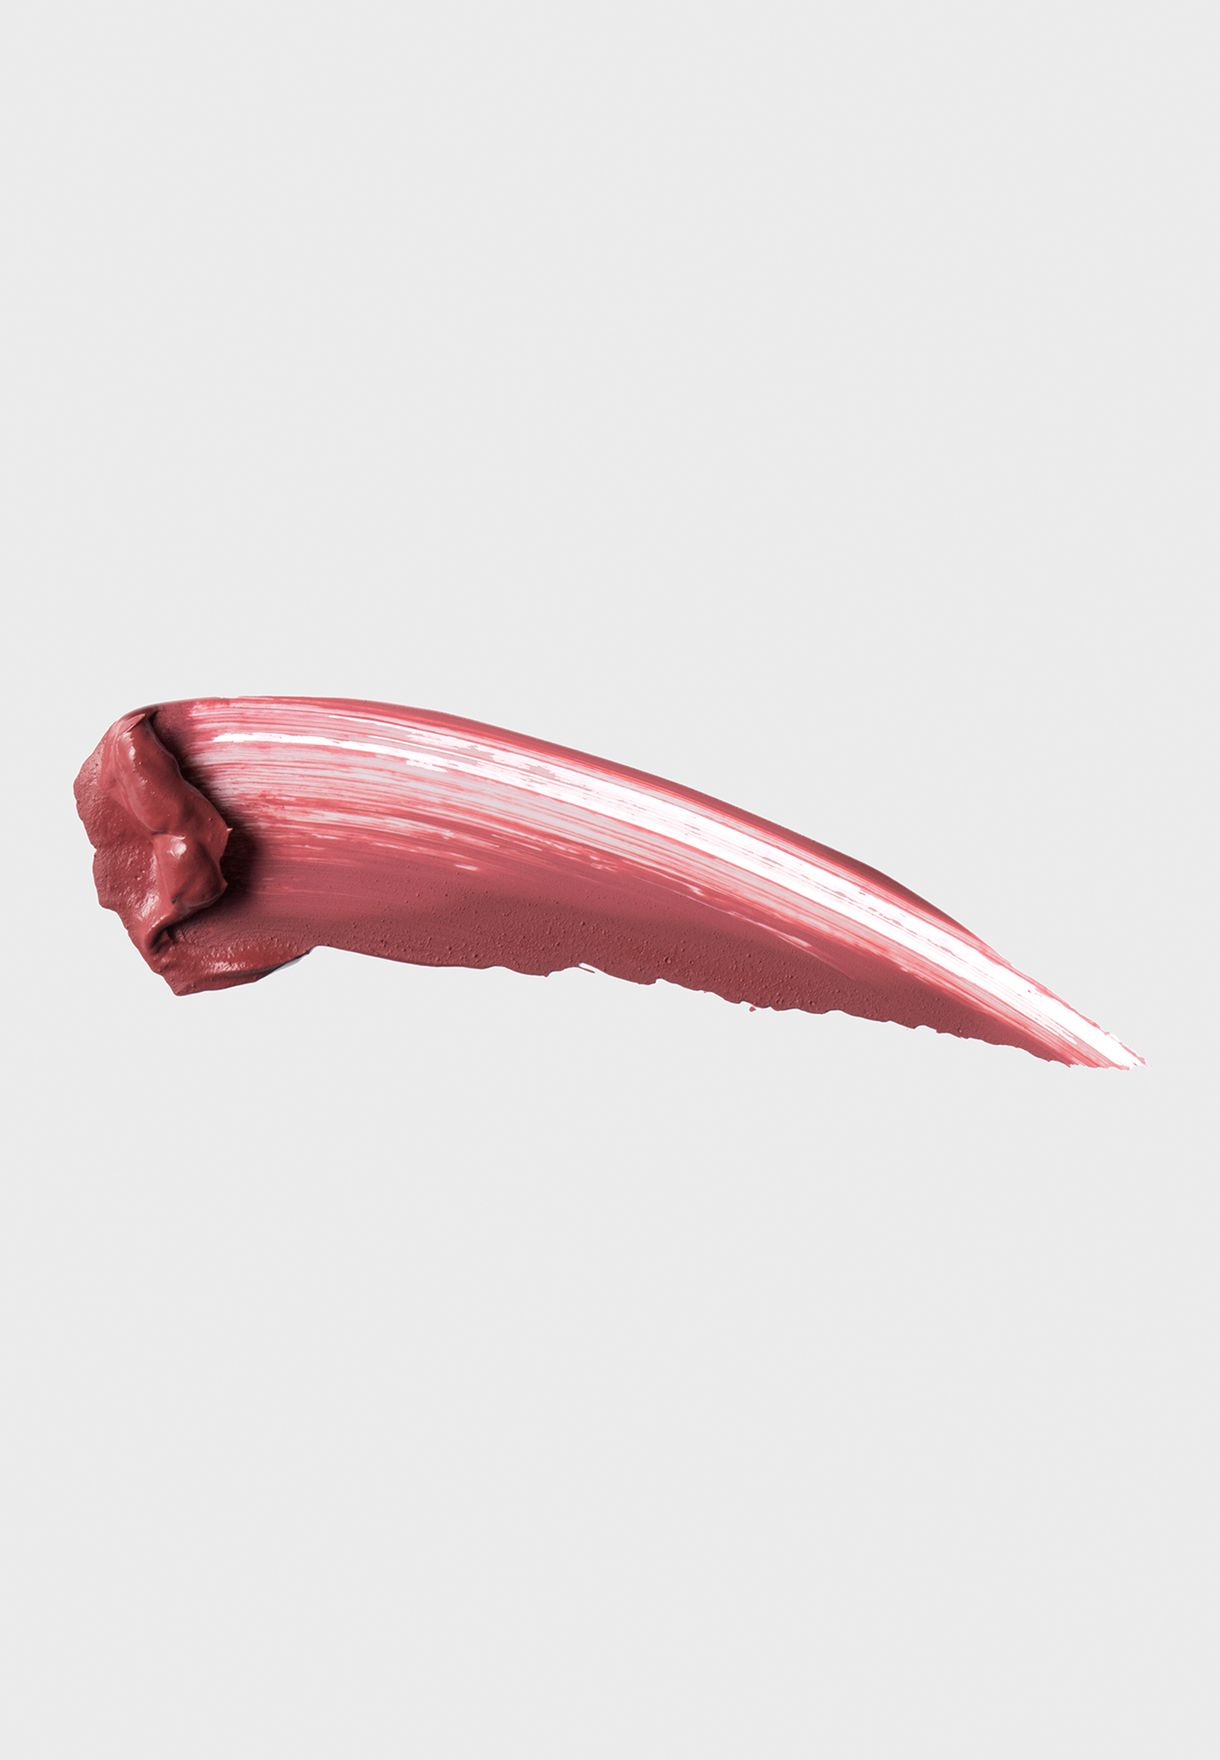 احمر شفاه سائل - كاثرين